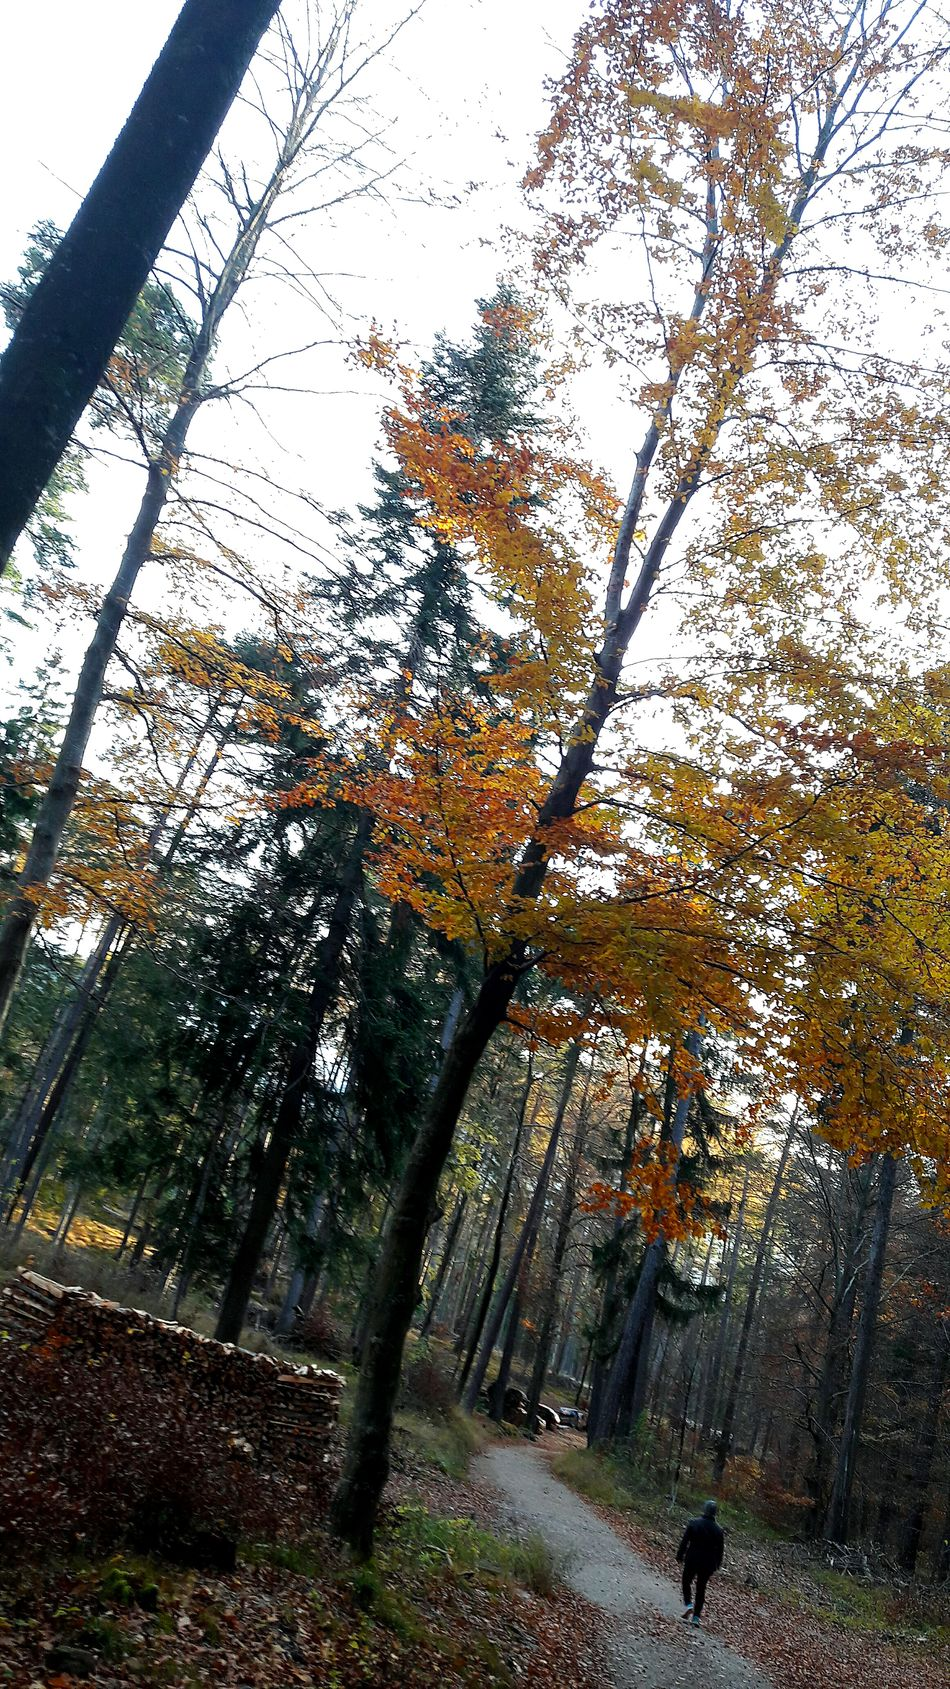 Berge Orang Nice Fresh Sunset Beauty In Nature Herbst 2016 Herbst🍁 Schönes Wetter Tree Swizzerland Bäume